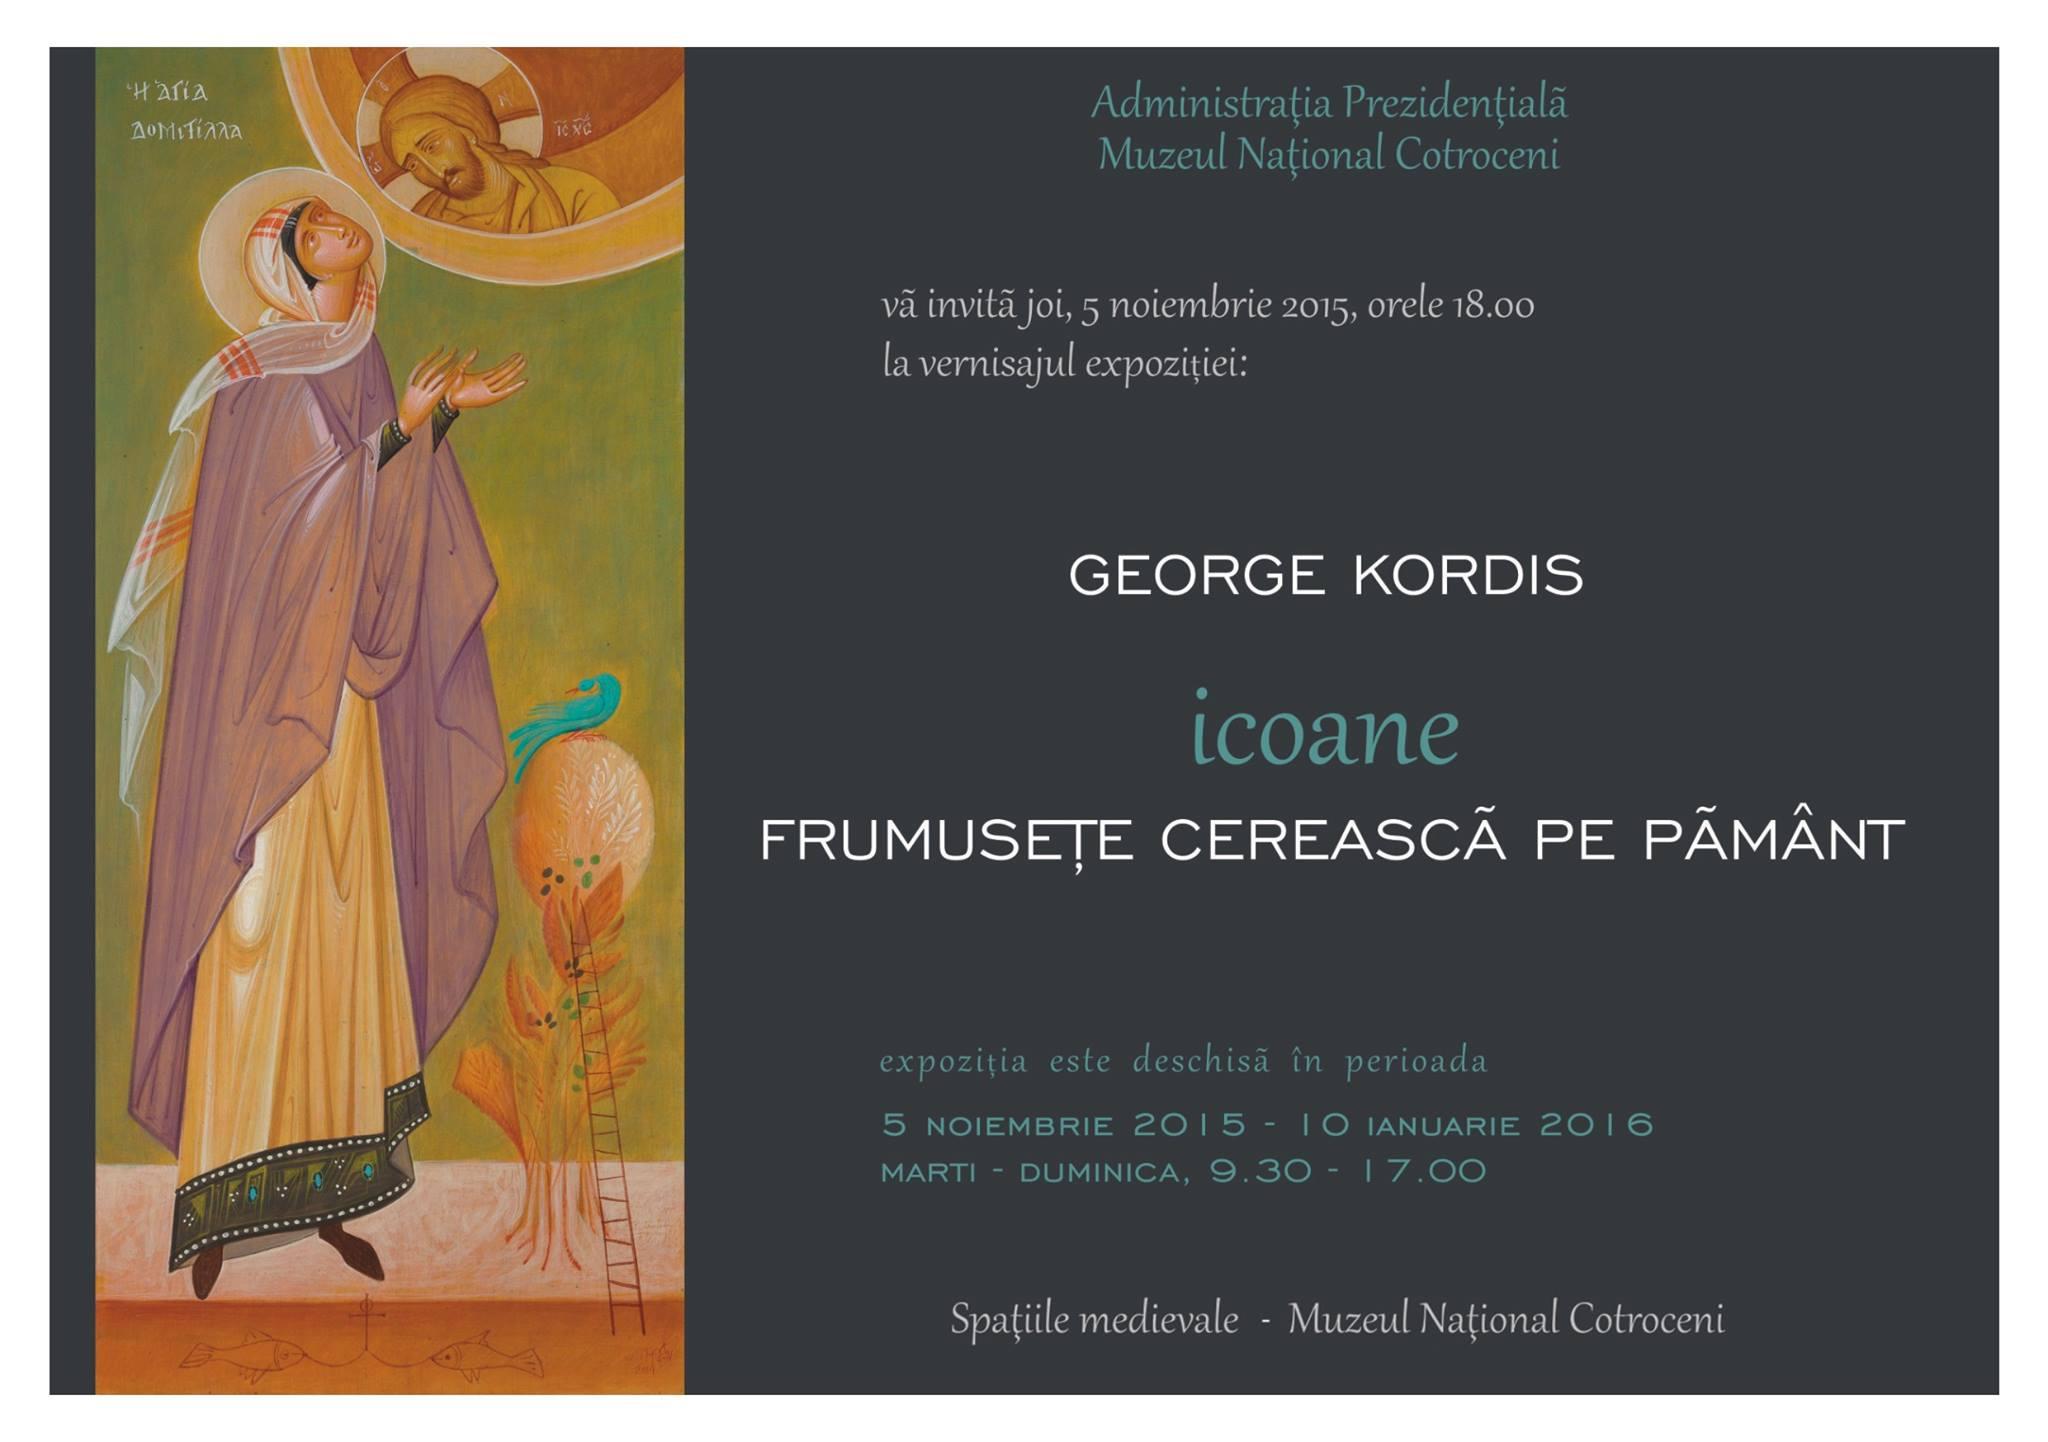 Joi, 15 noiembrie 2015 - Expozitie George Kordis: Icoane. Frumusete cereasca pe pamant